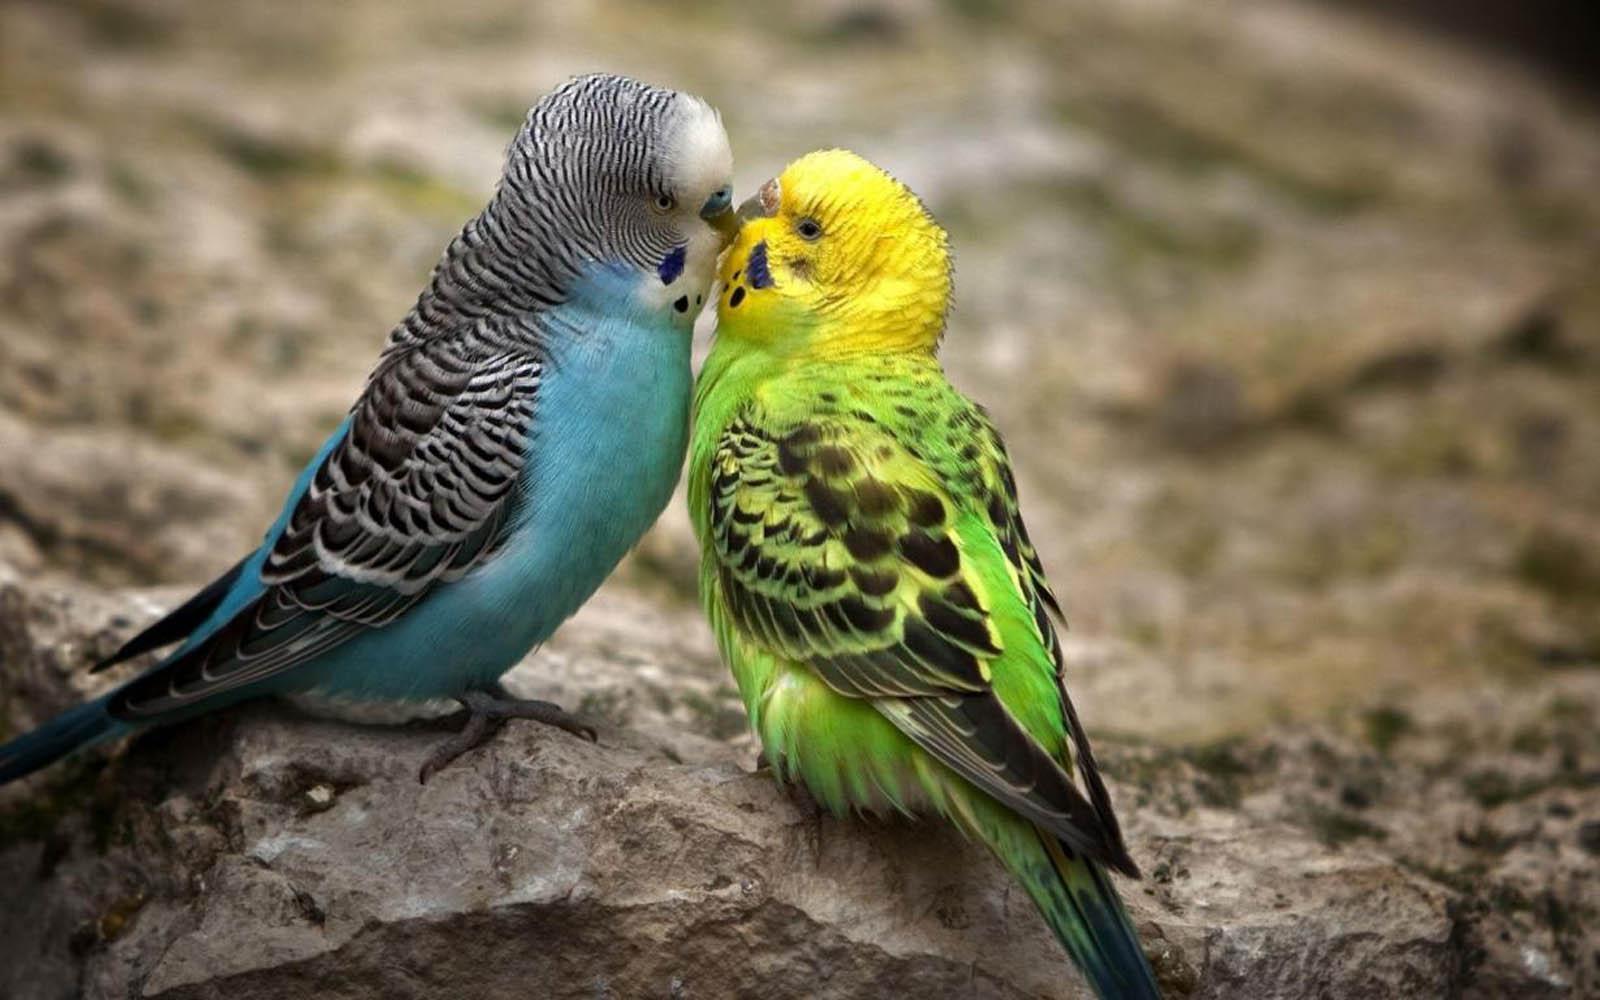 Gambar Burung Burung Yang Berpasangan Wallpapersforfree